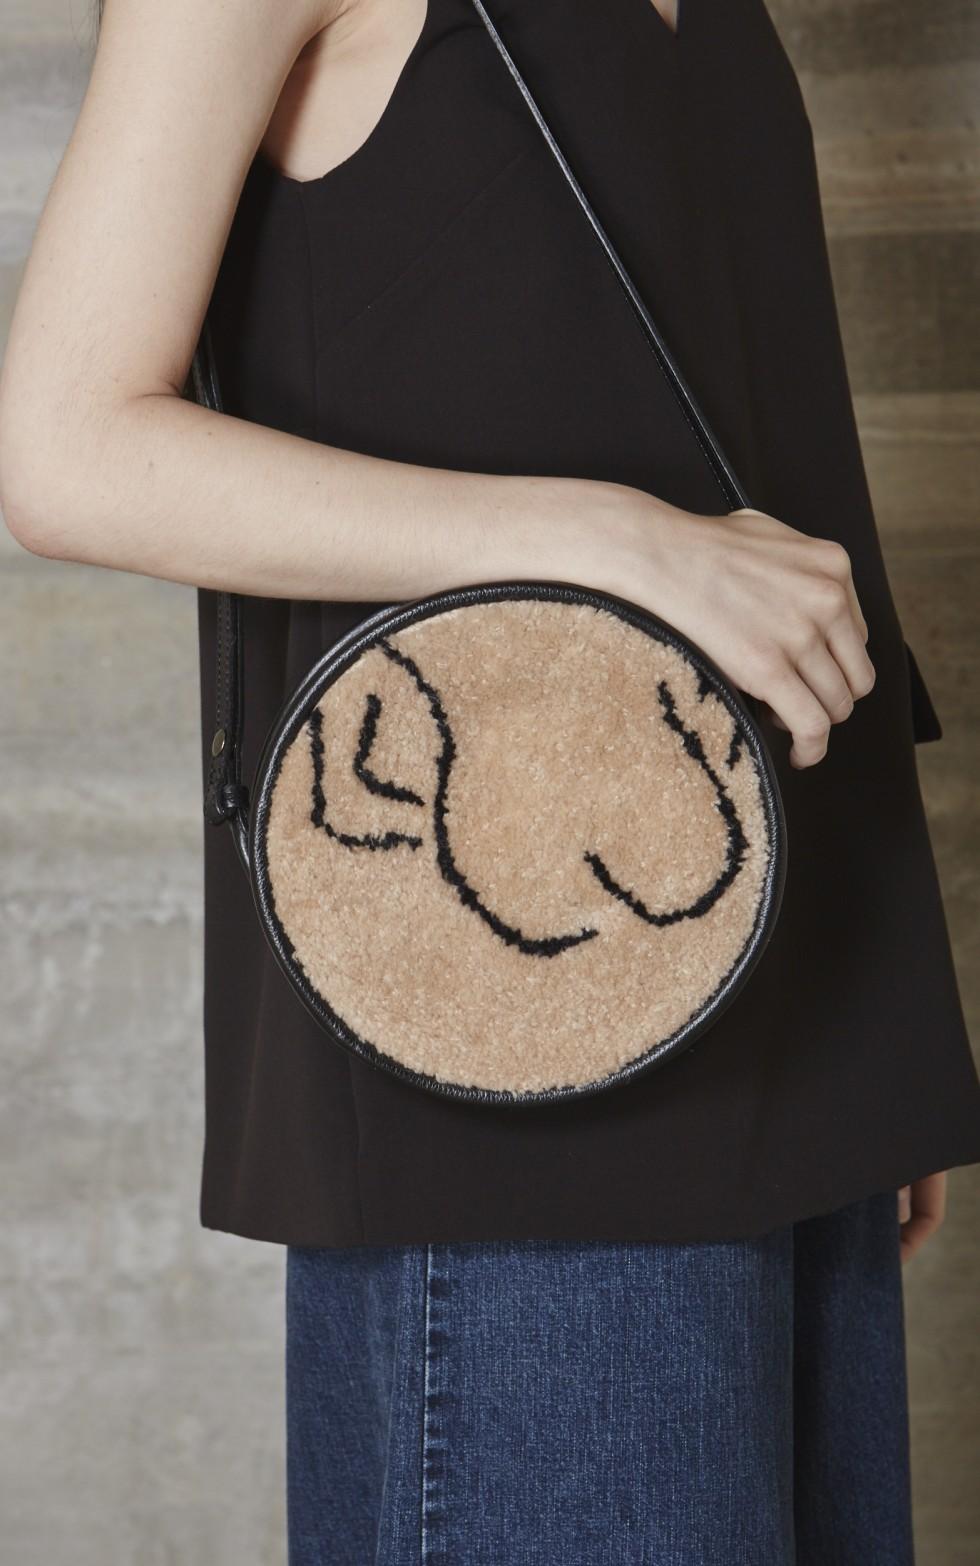 Le sac Rachel Comey